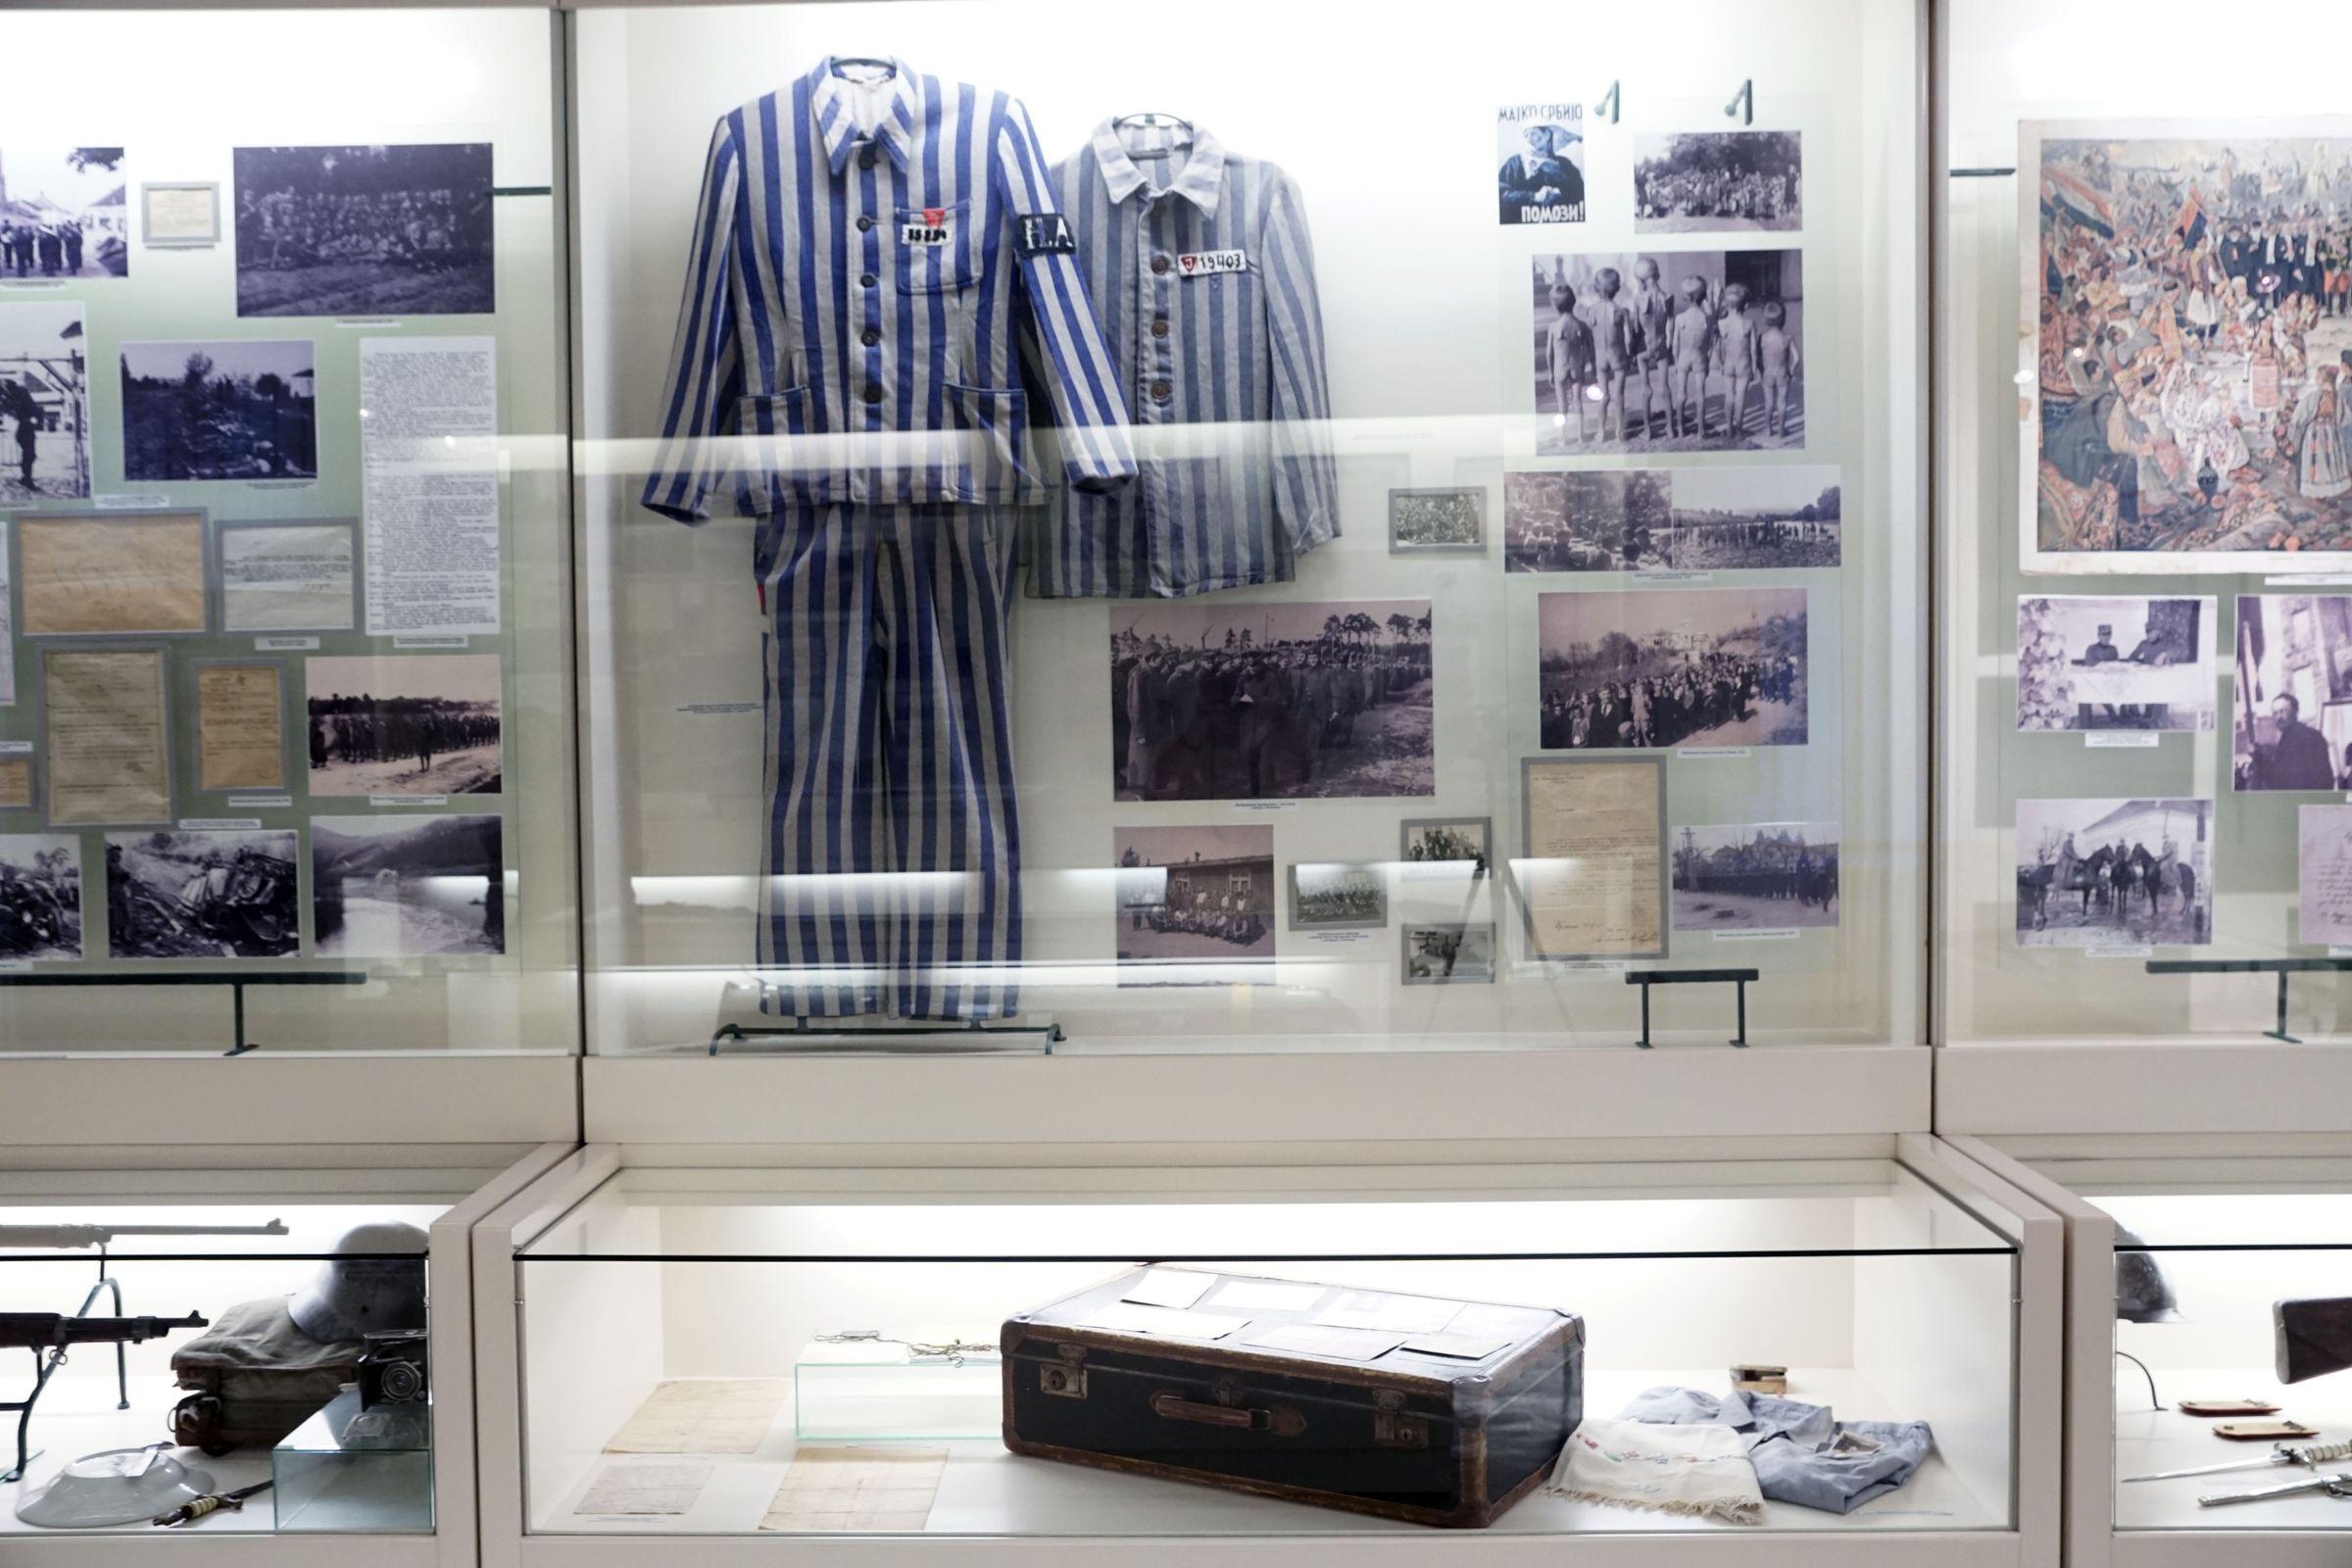 isplay cases dedicated to World War II in Kraljevo